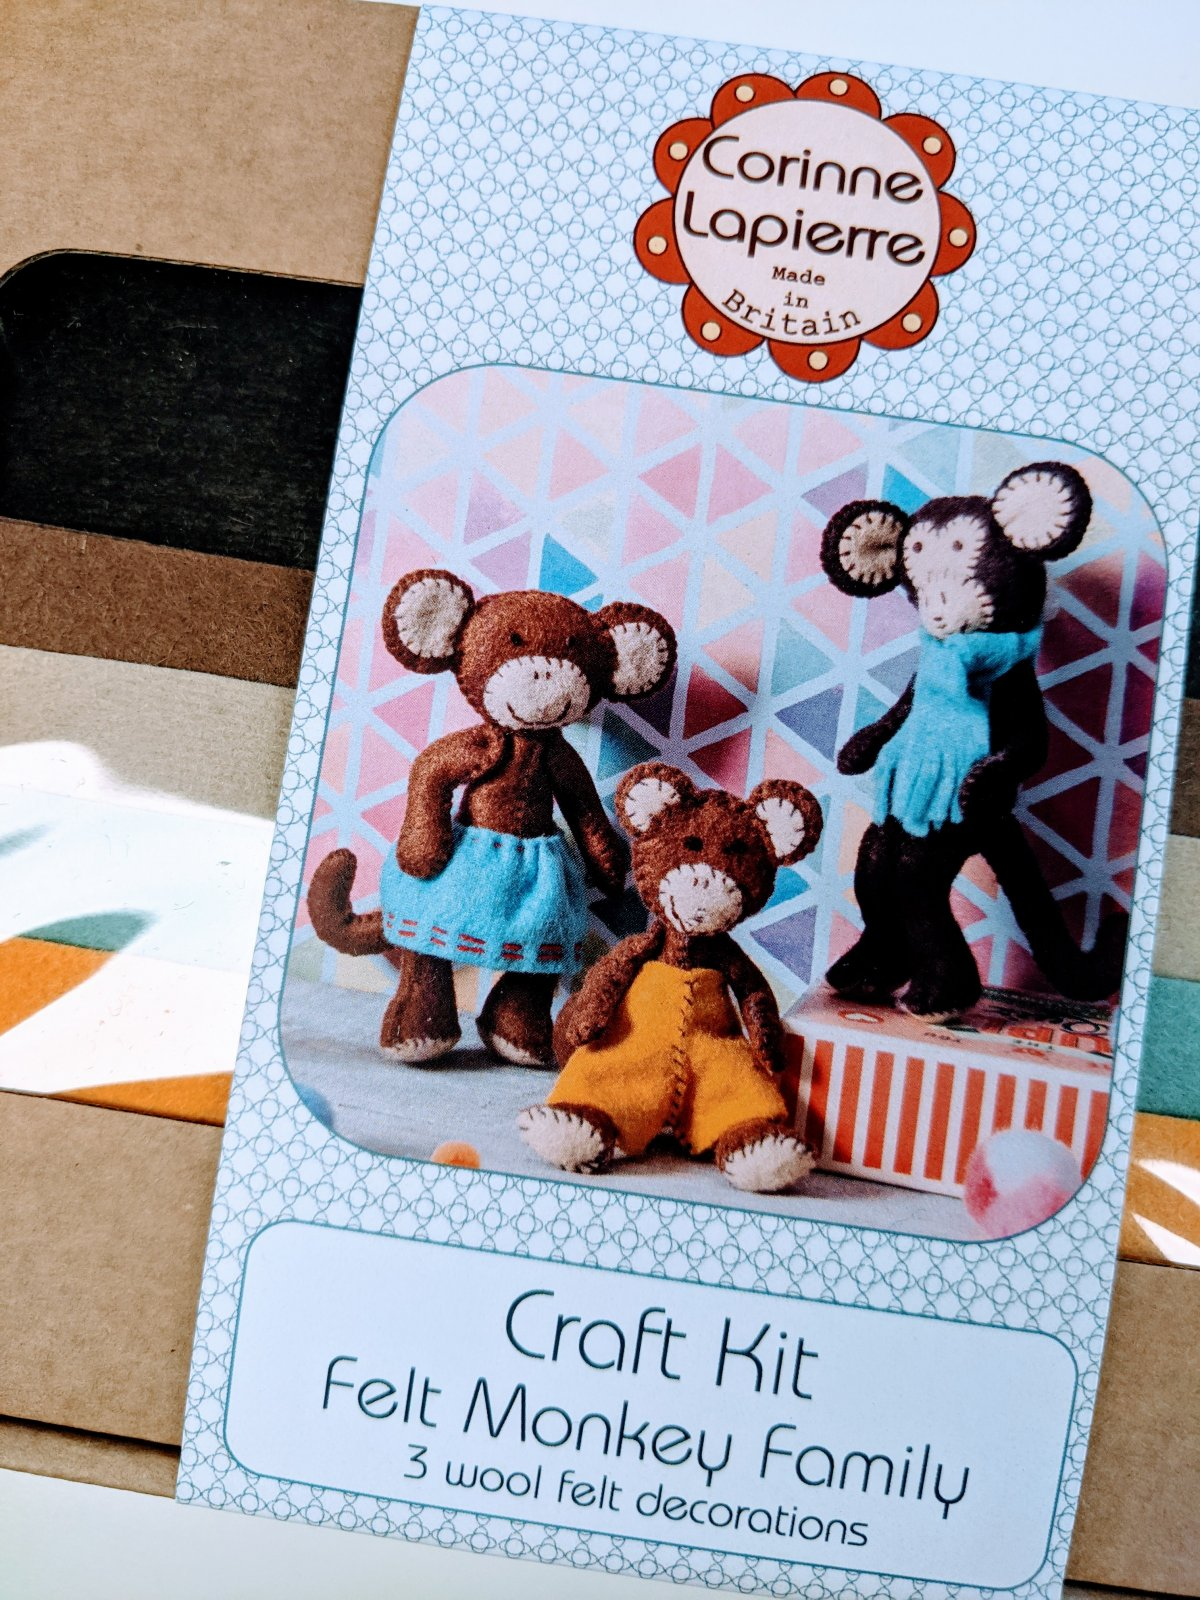 Monkey Family Felt Kit by Corinne Lapierre